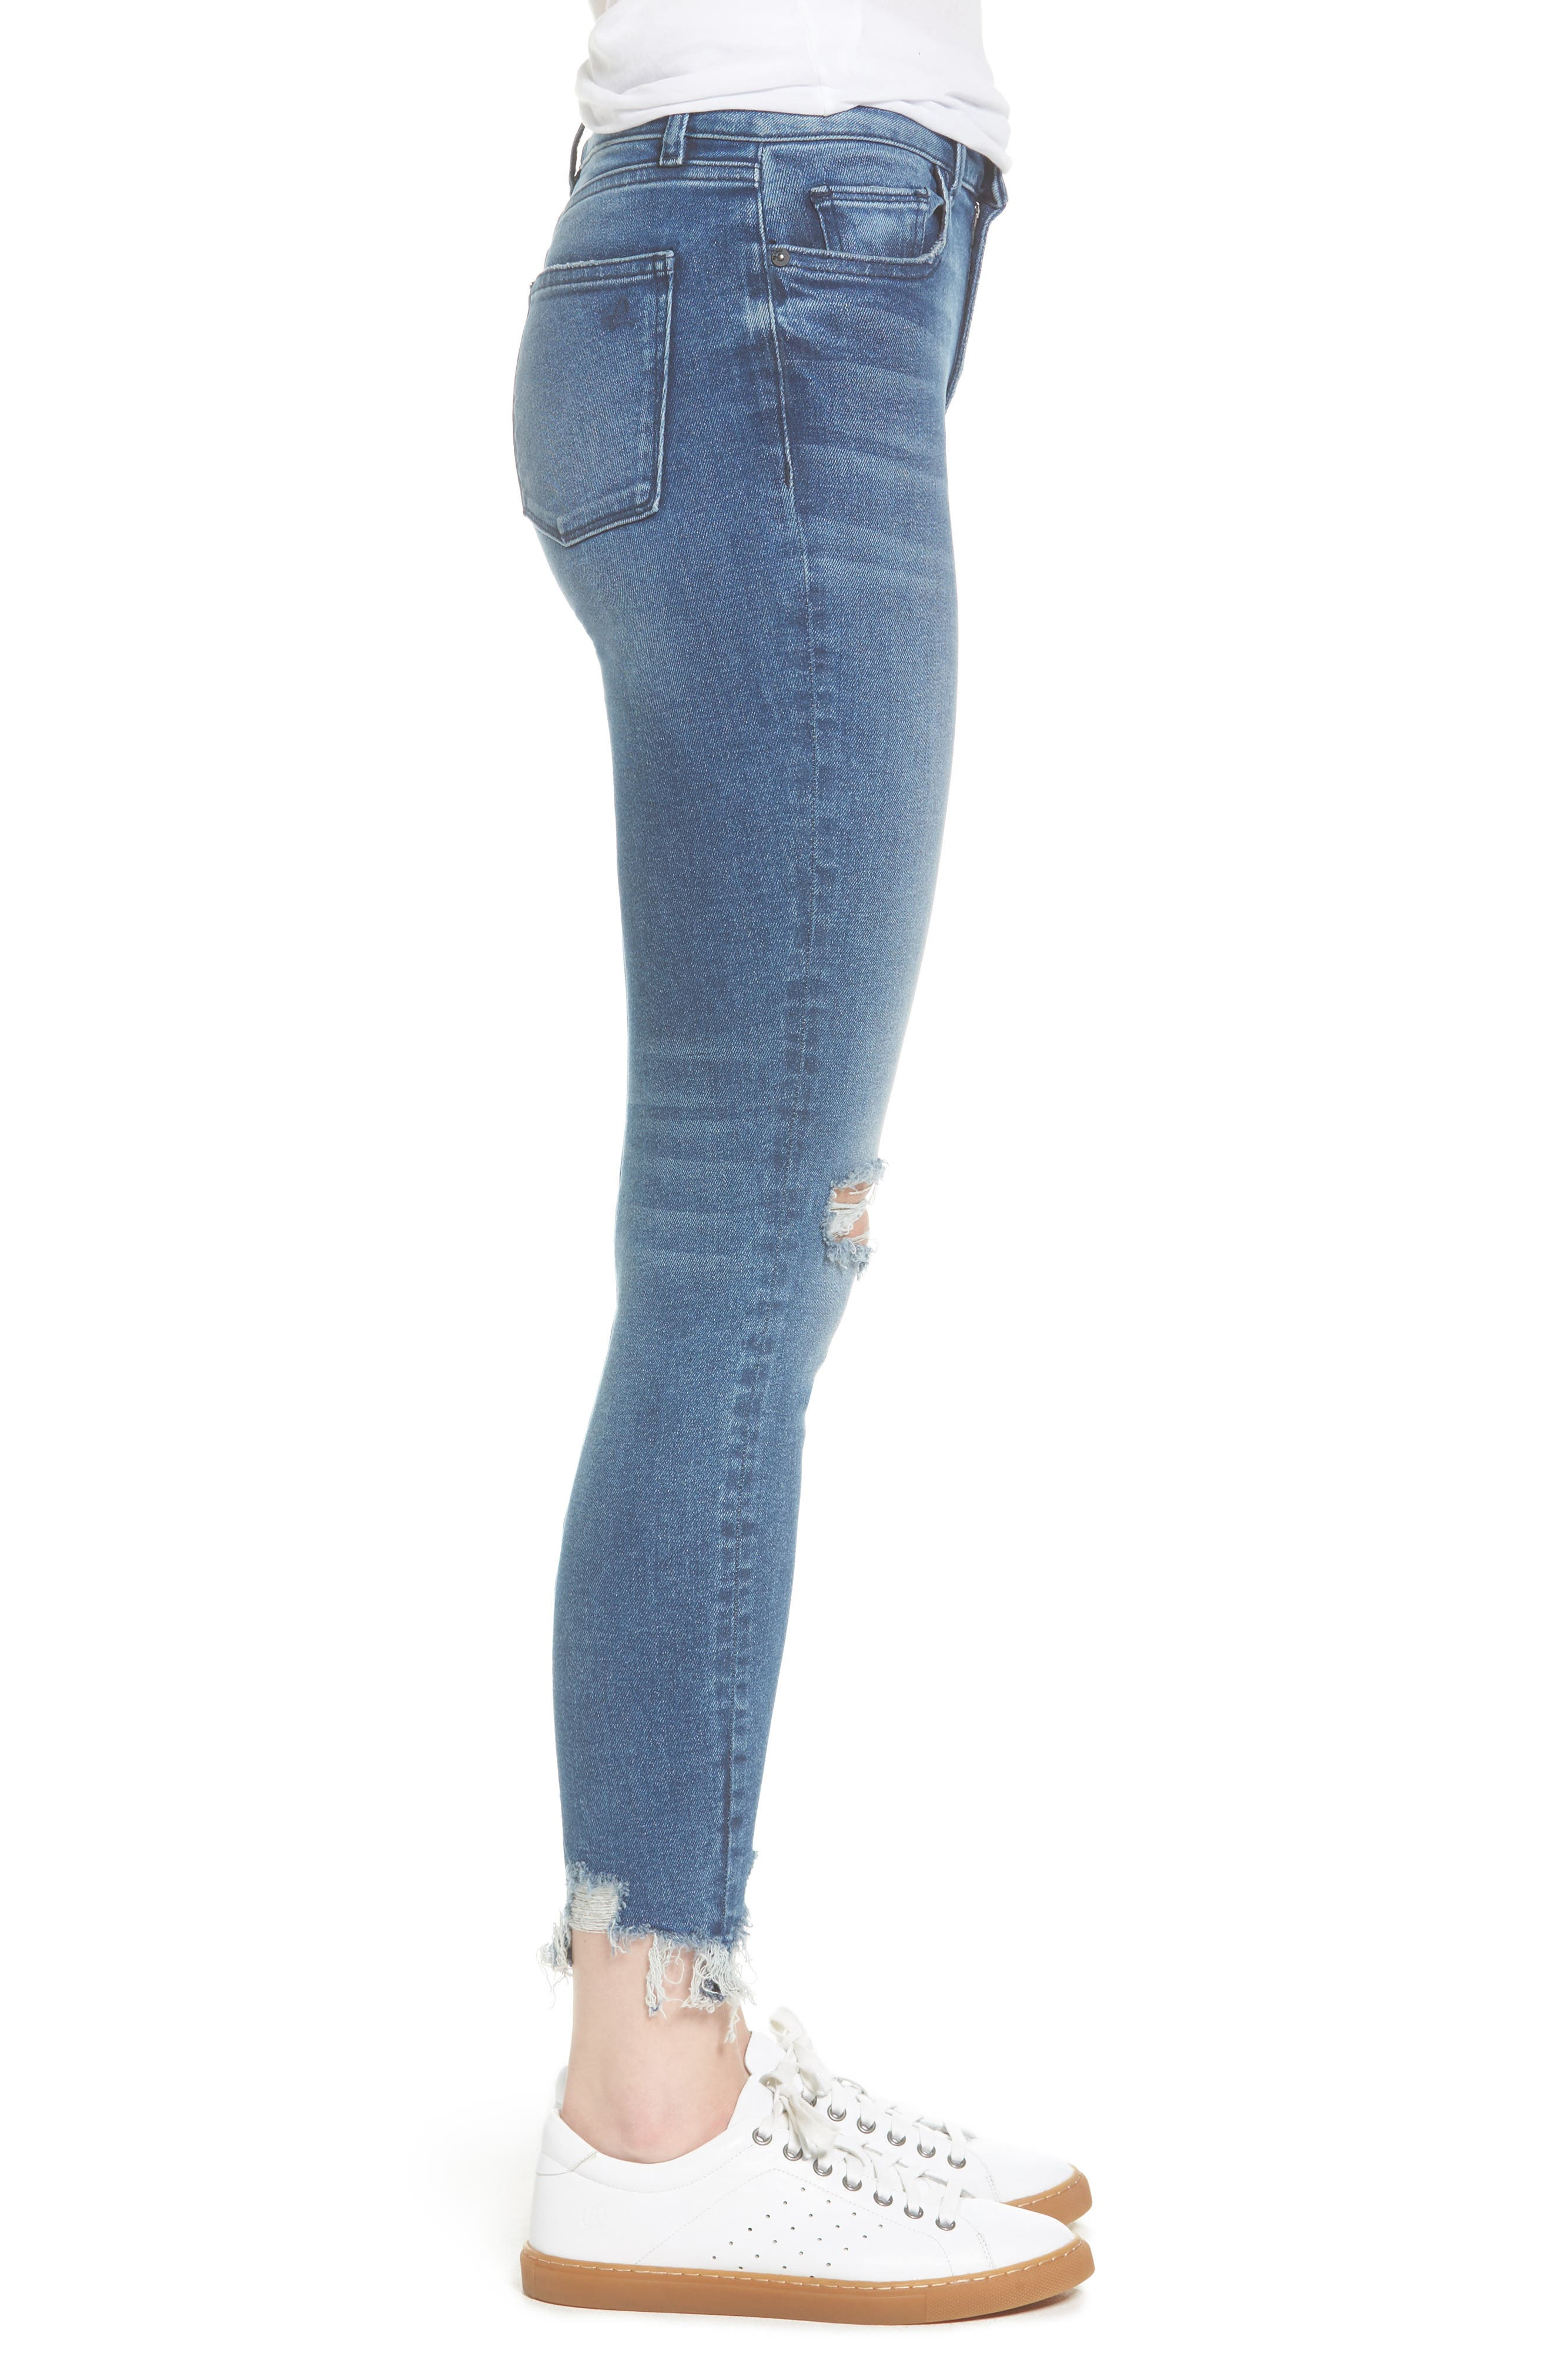 Farrow Instaslim High Waist Ankle Skinny Jeans,                             Alternate thumbnail 3, color,                             430